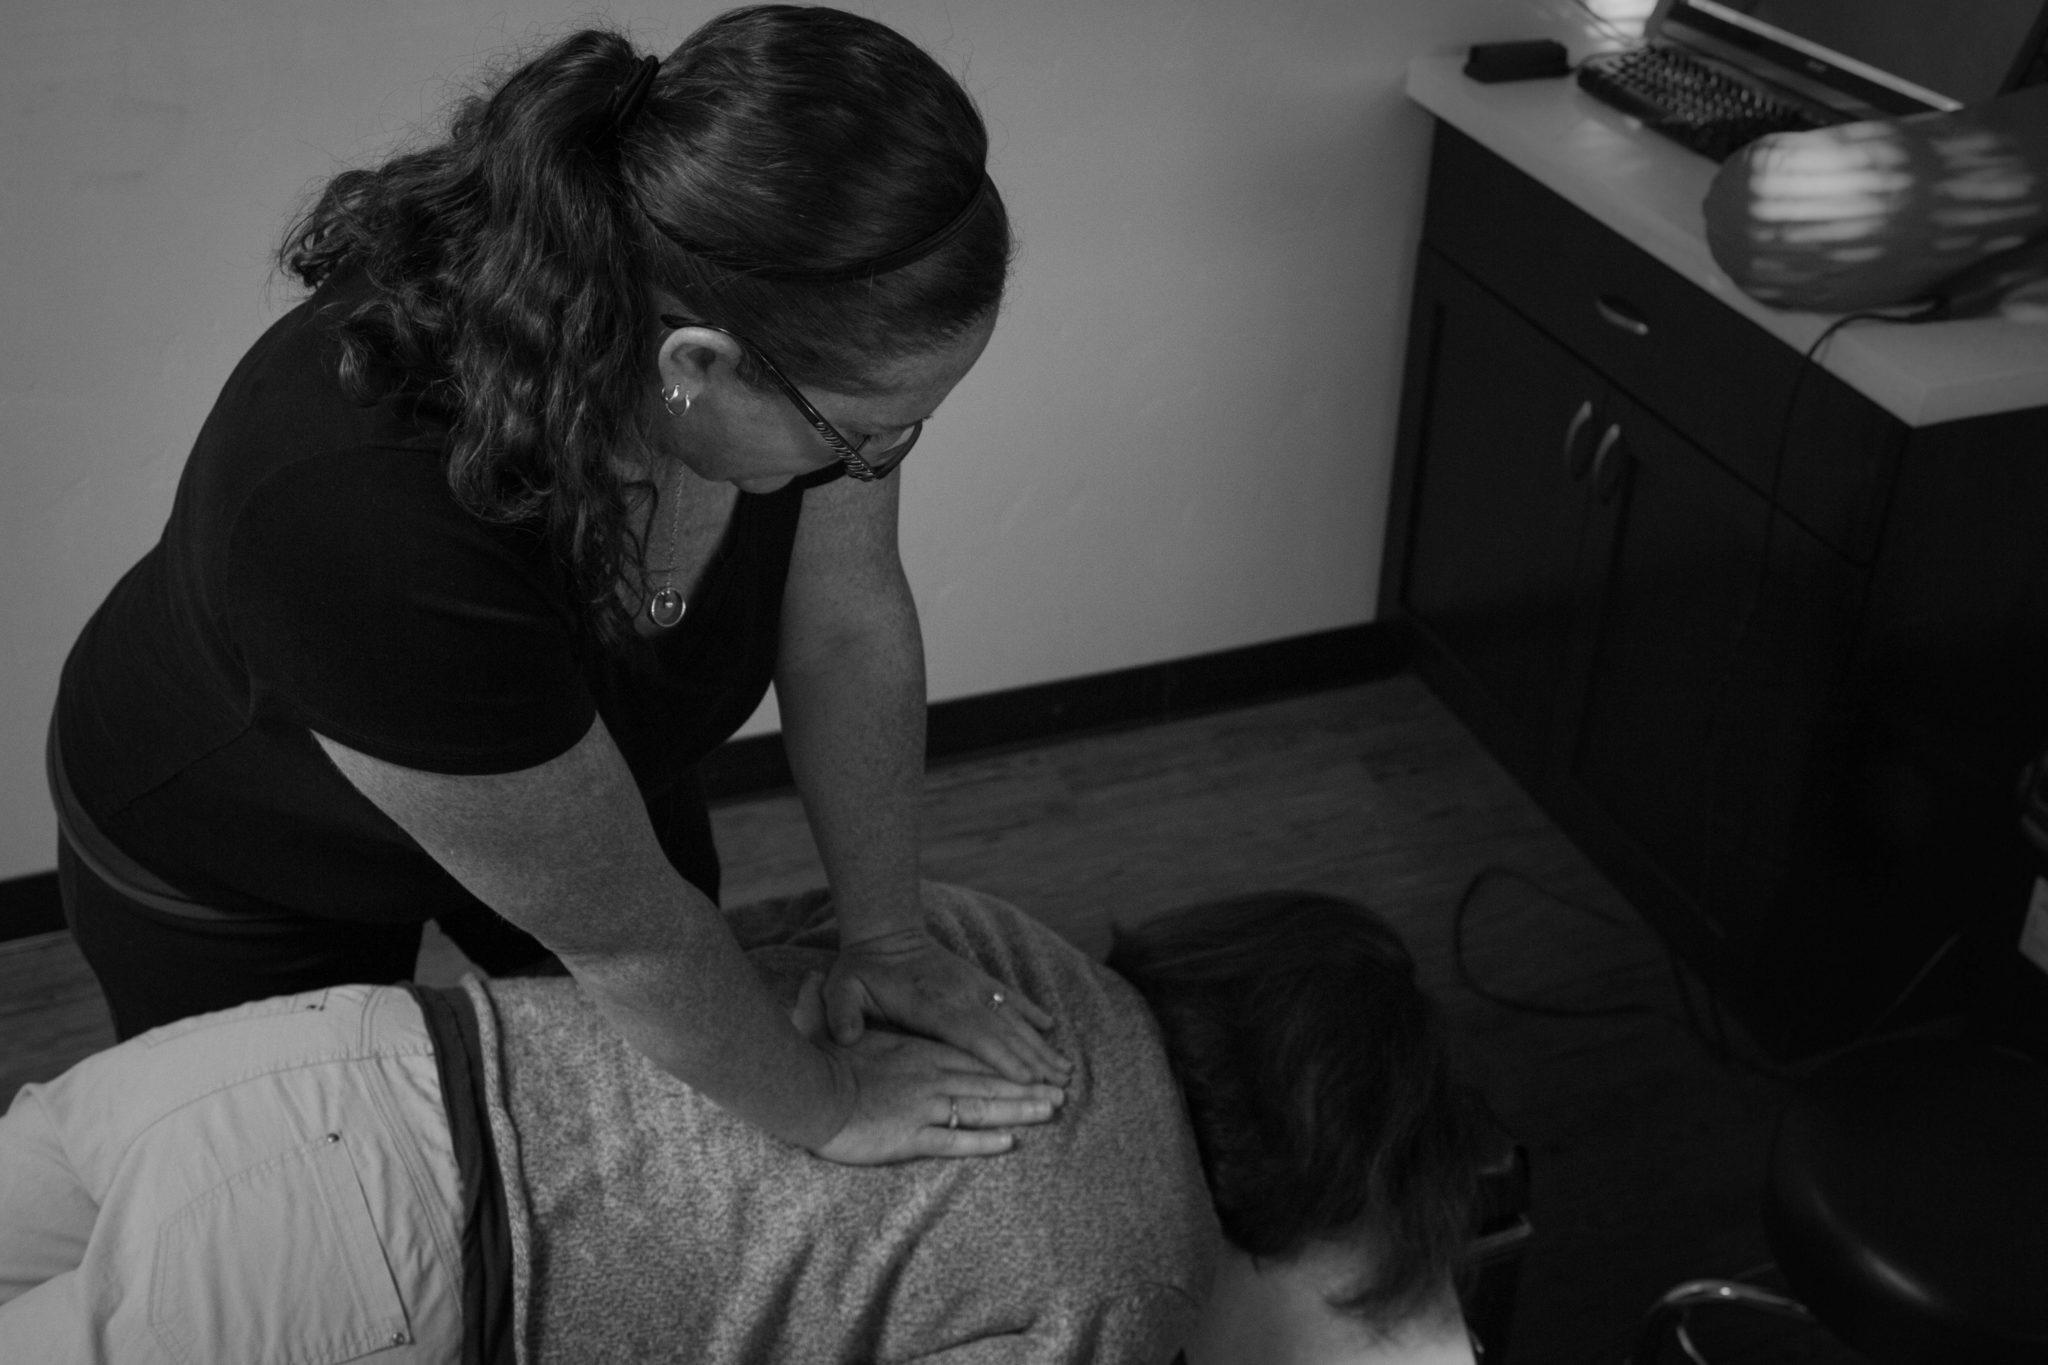 Holistic Chiropractic